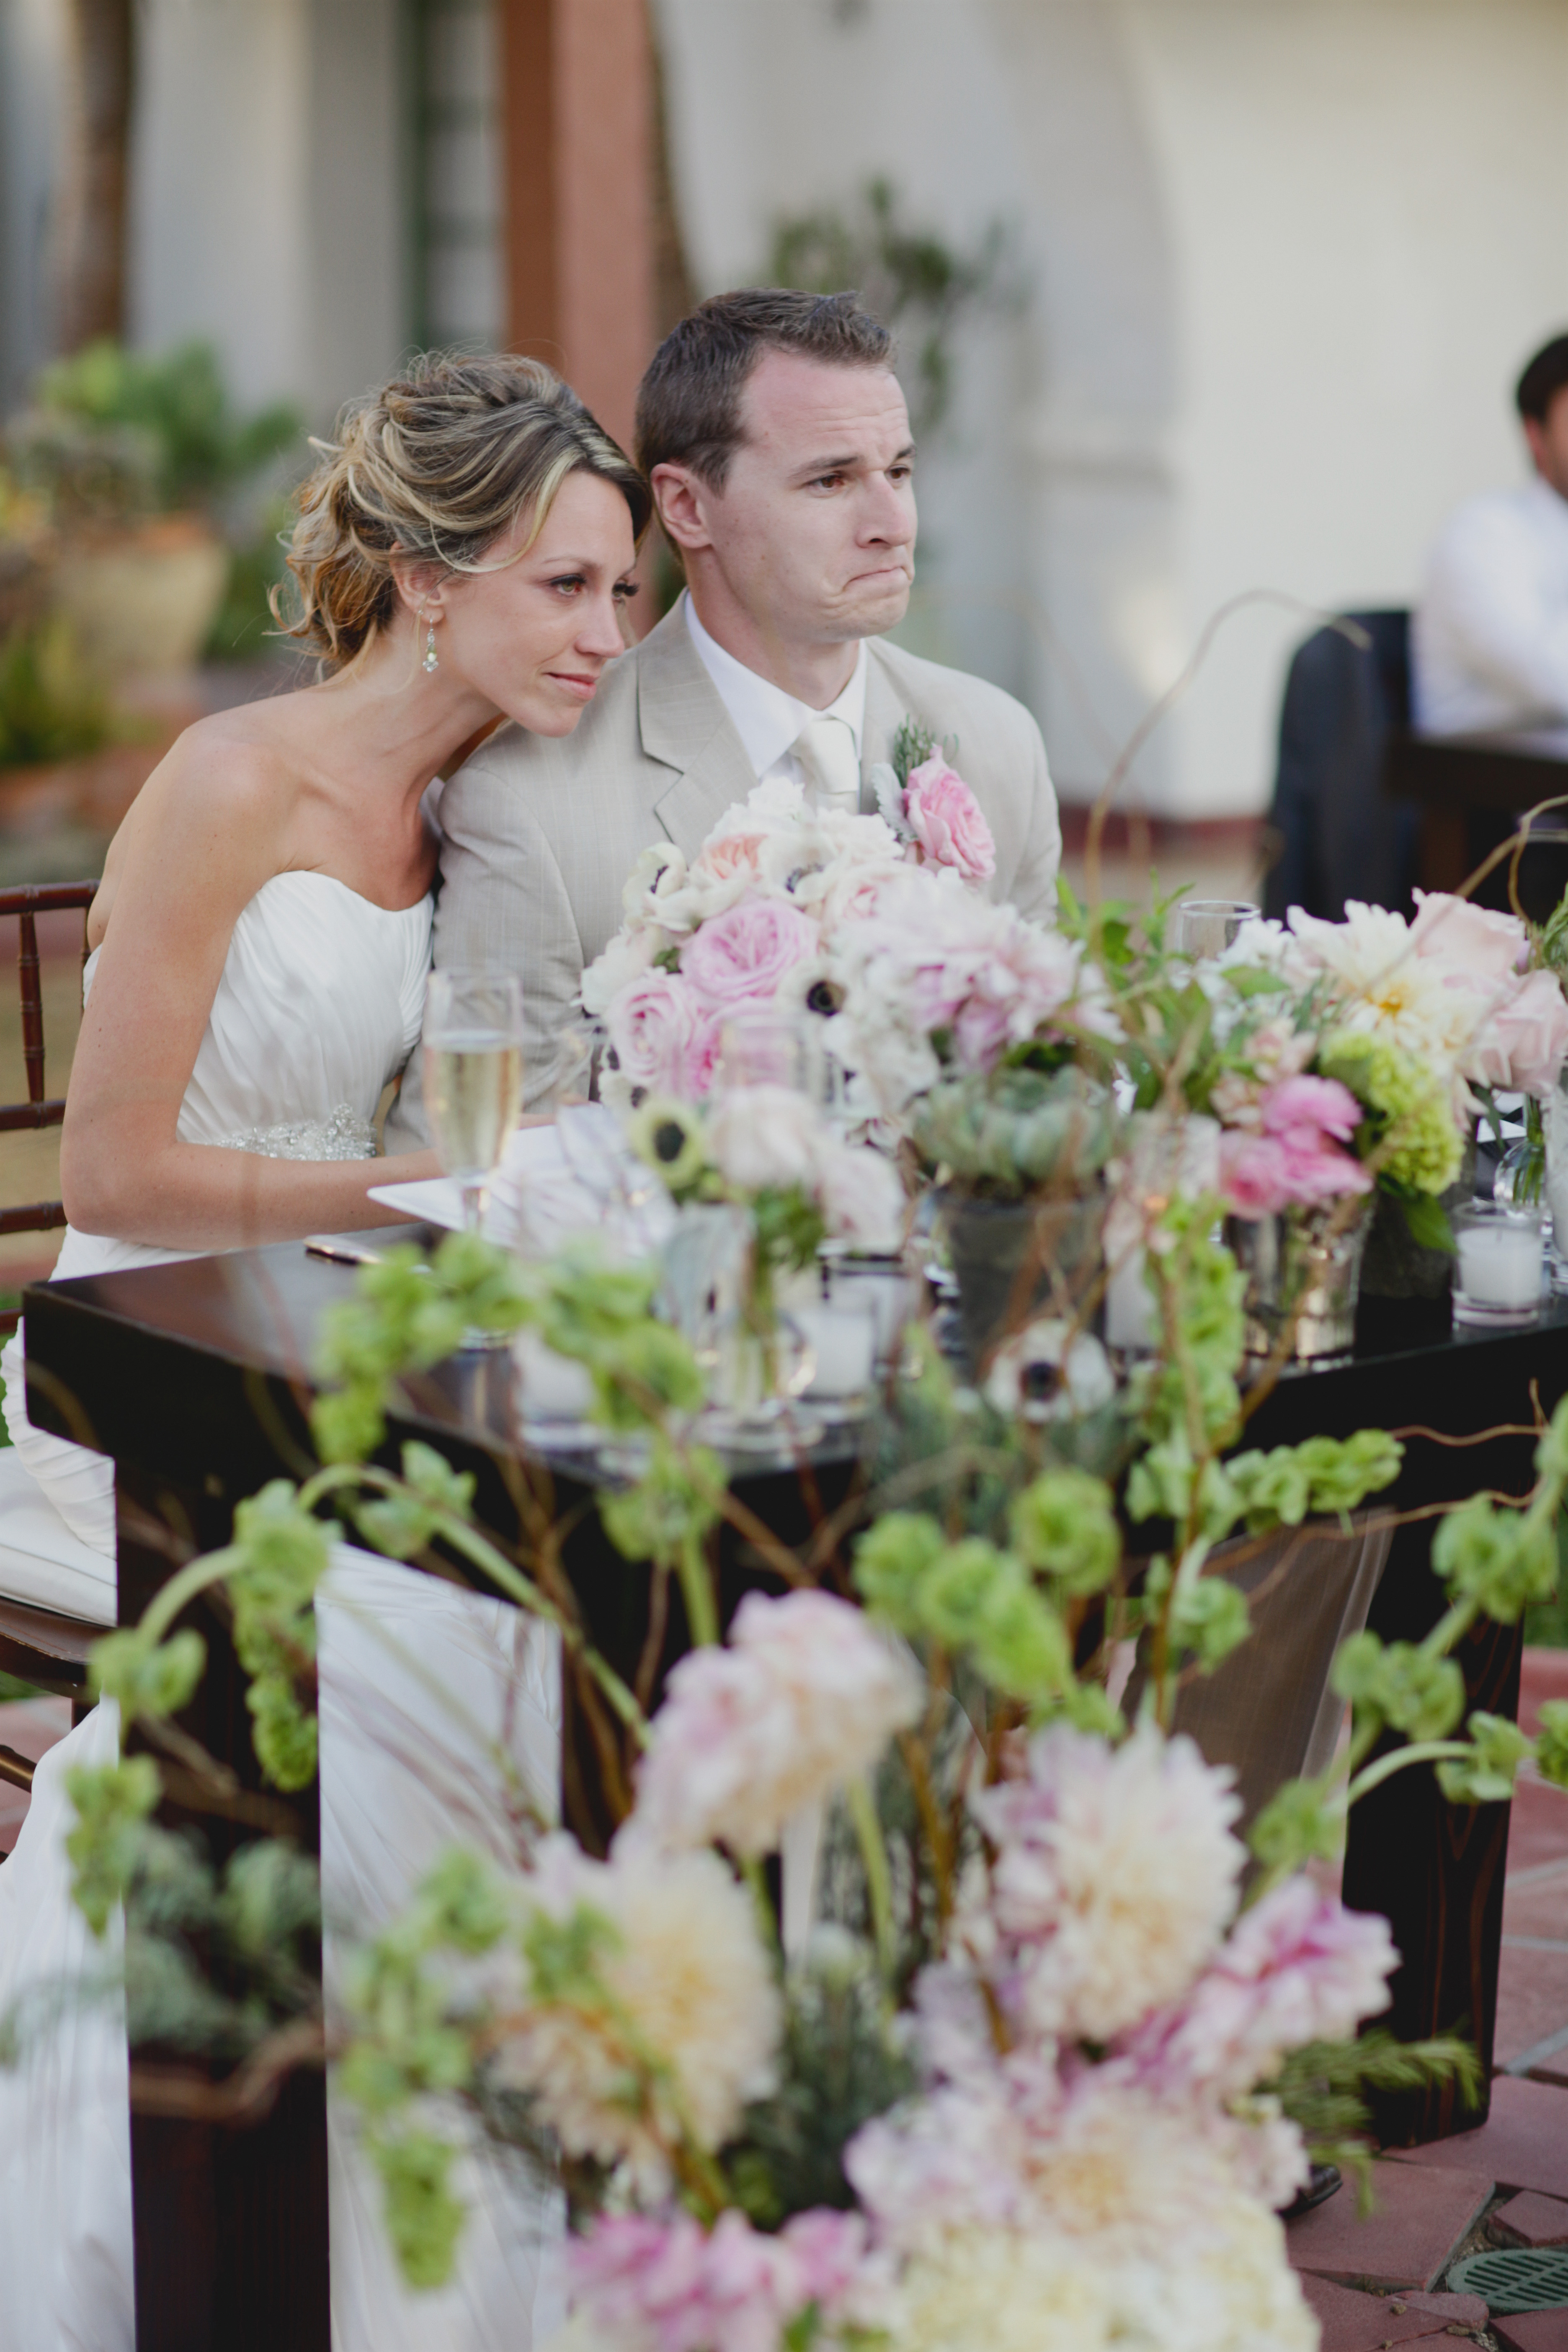 Casa Romantica Wedding, Orange County Destination Wedding Planner, San Clemente Historic Wedding Venue